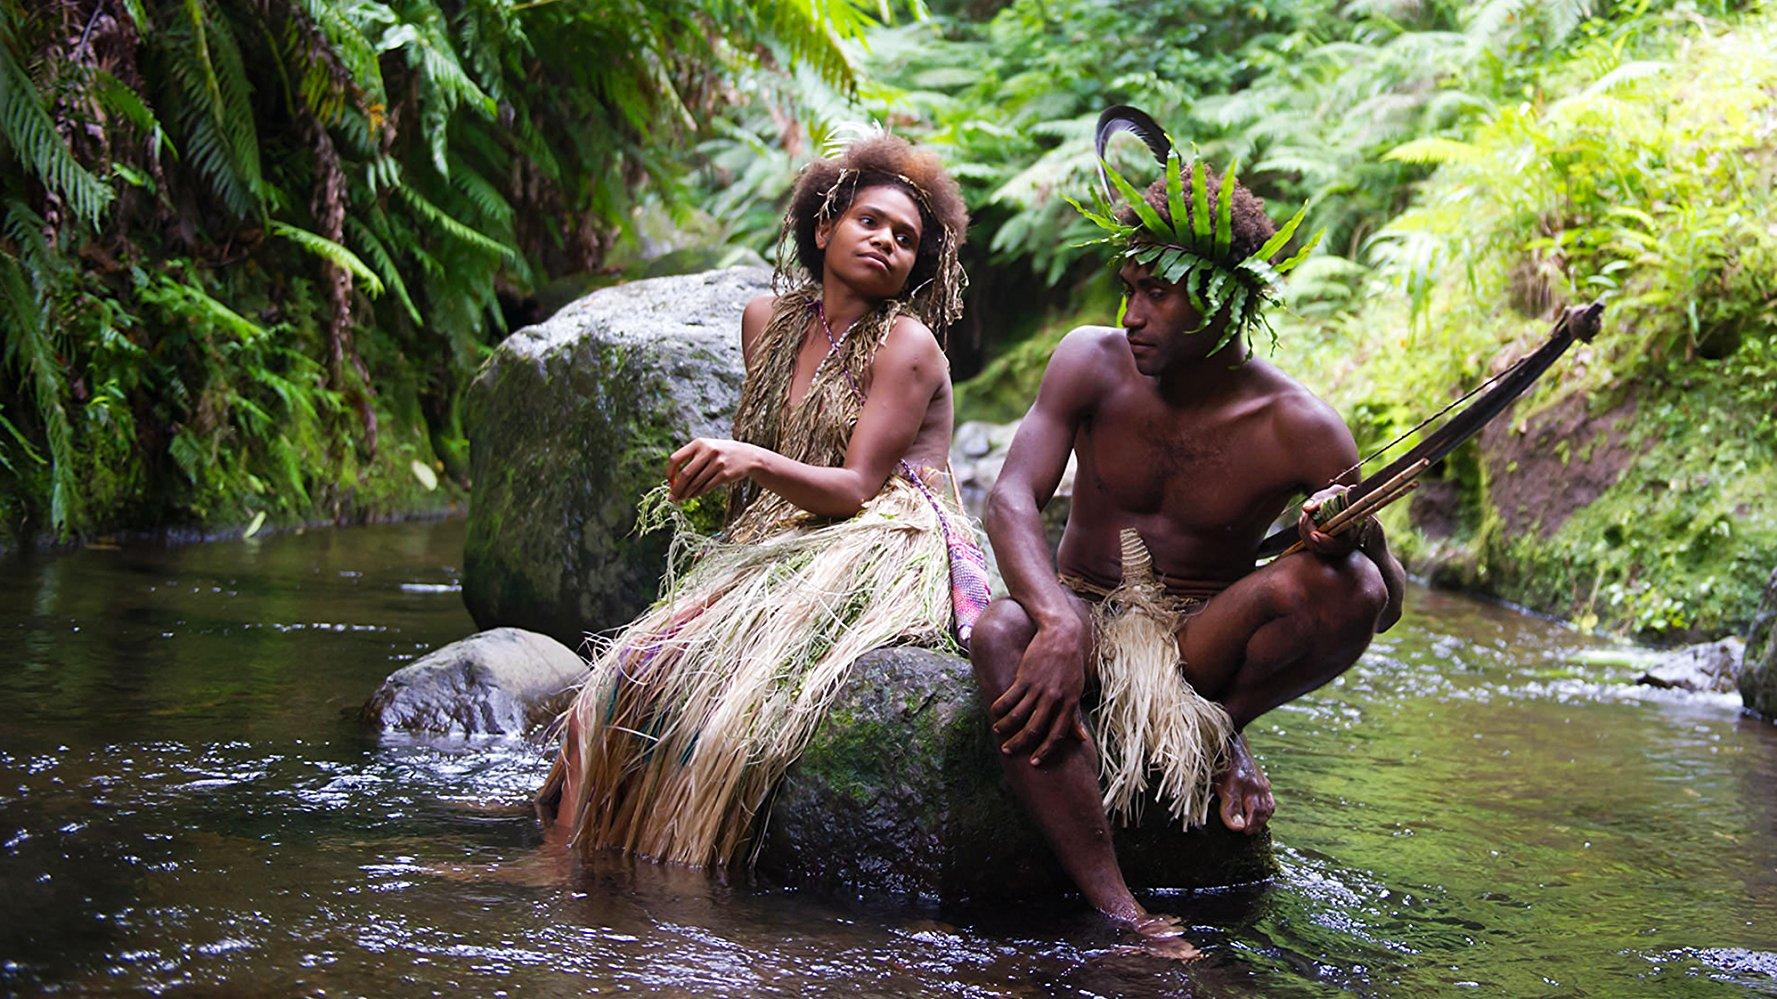 Дикие нравы: 5 фильмов о первобытных племенах MV5BMTYwNjA1MTYzMV5BMl5BanBnXkFtZTgwODMyNjc5OTE